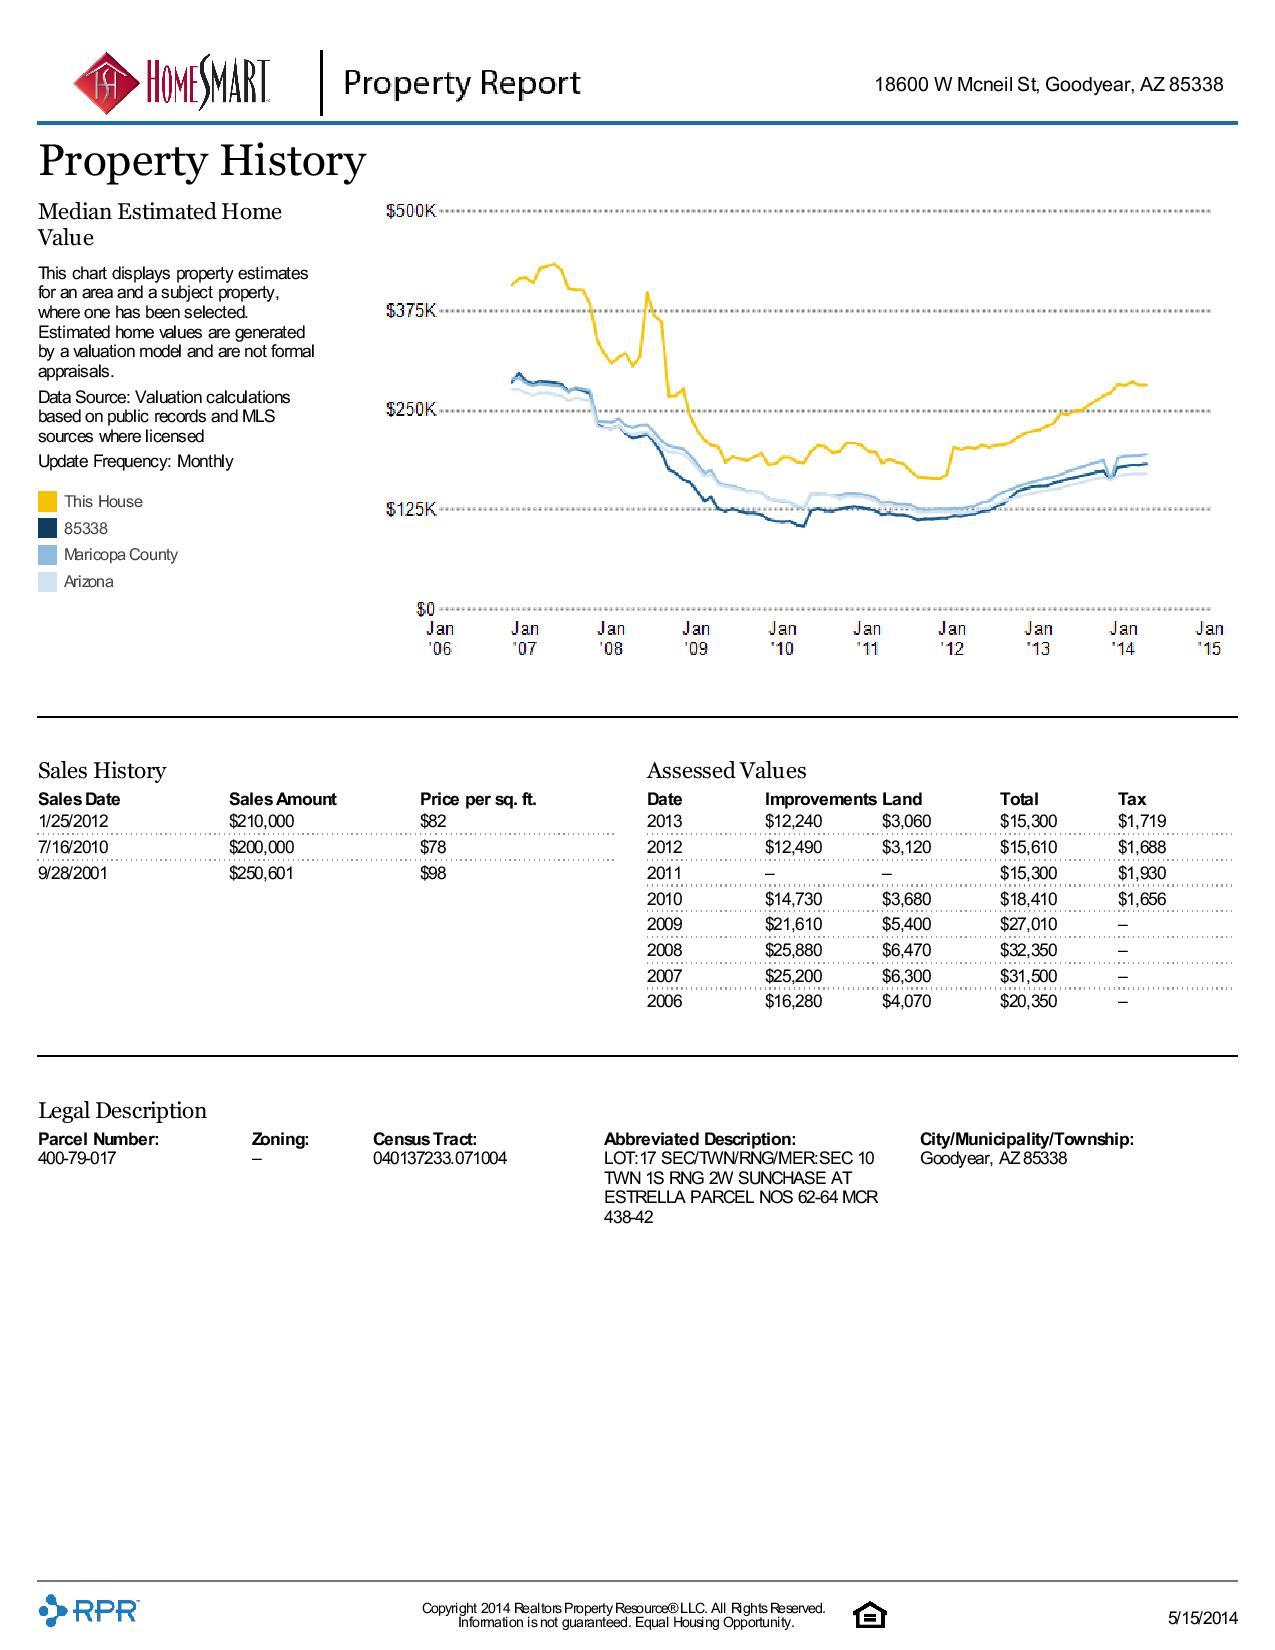 18600-W-Mcneil-St-Goodyear-AZ-85338-page-009